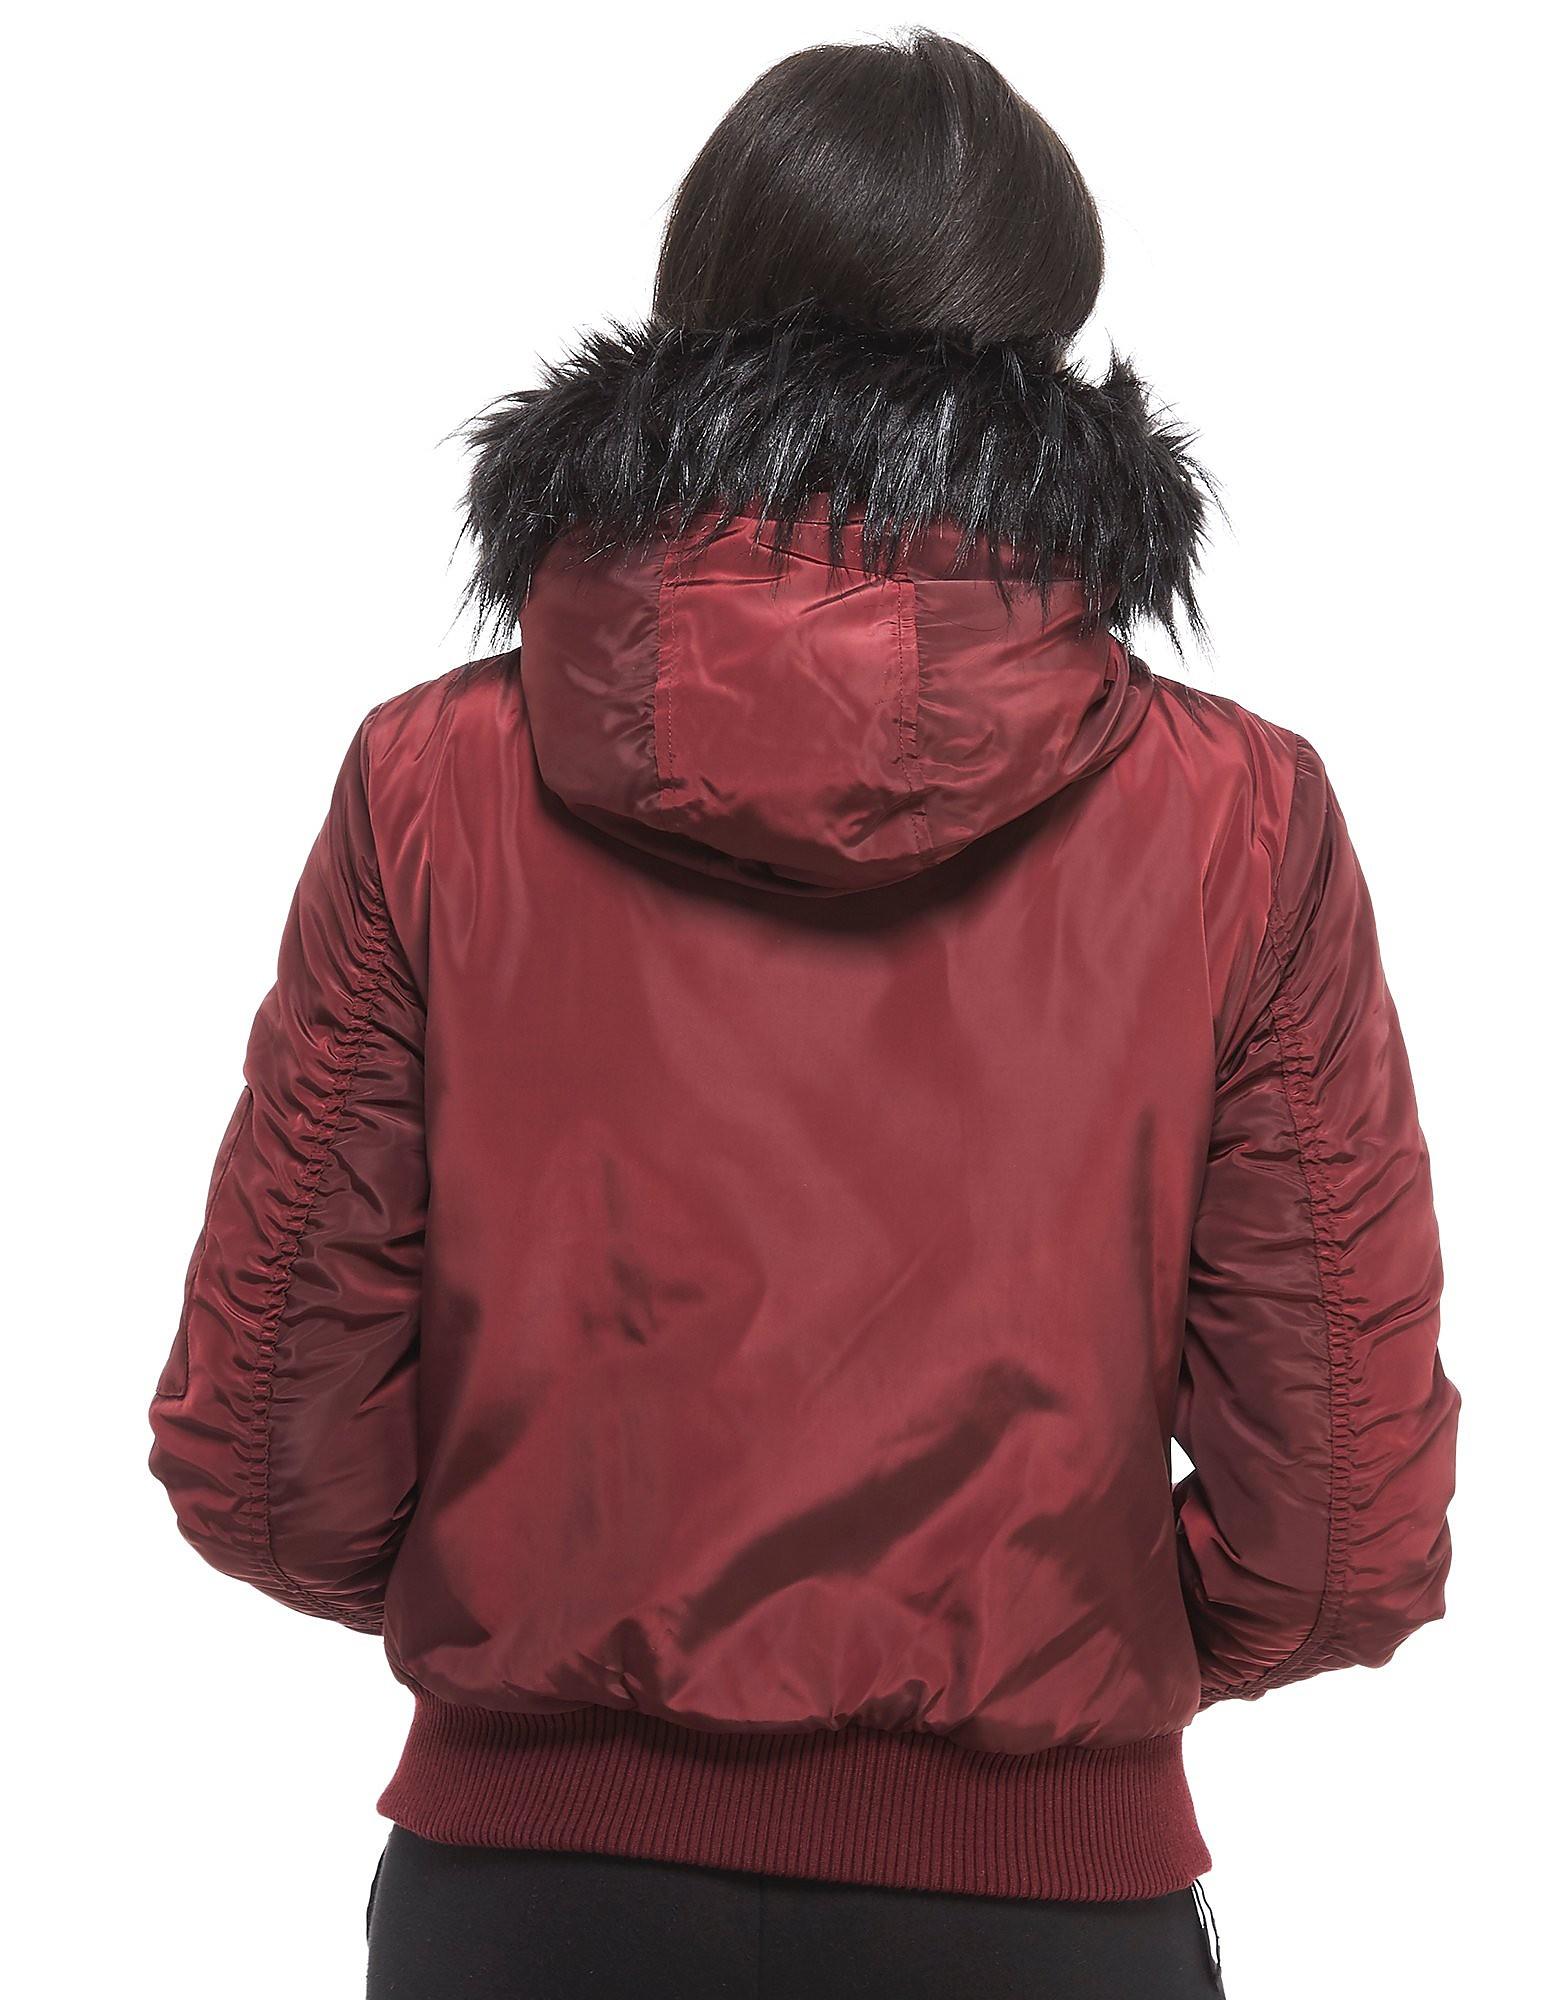 Supply & Demand Cropped MA1 Jacket